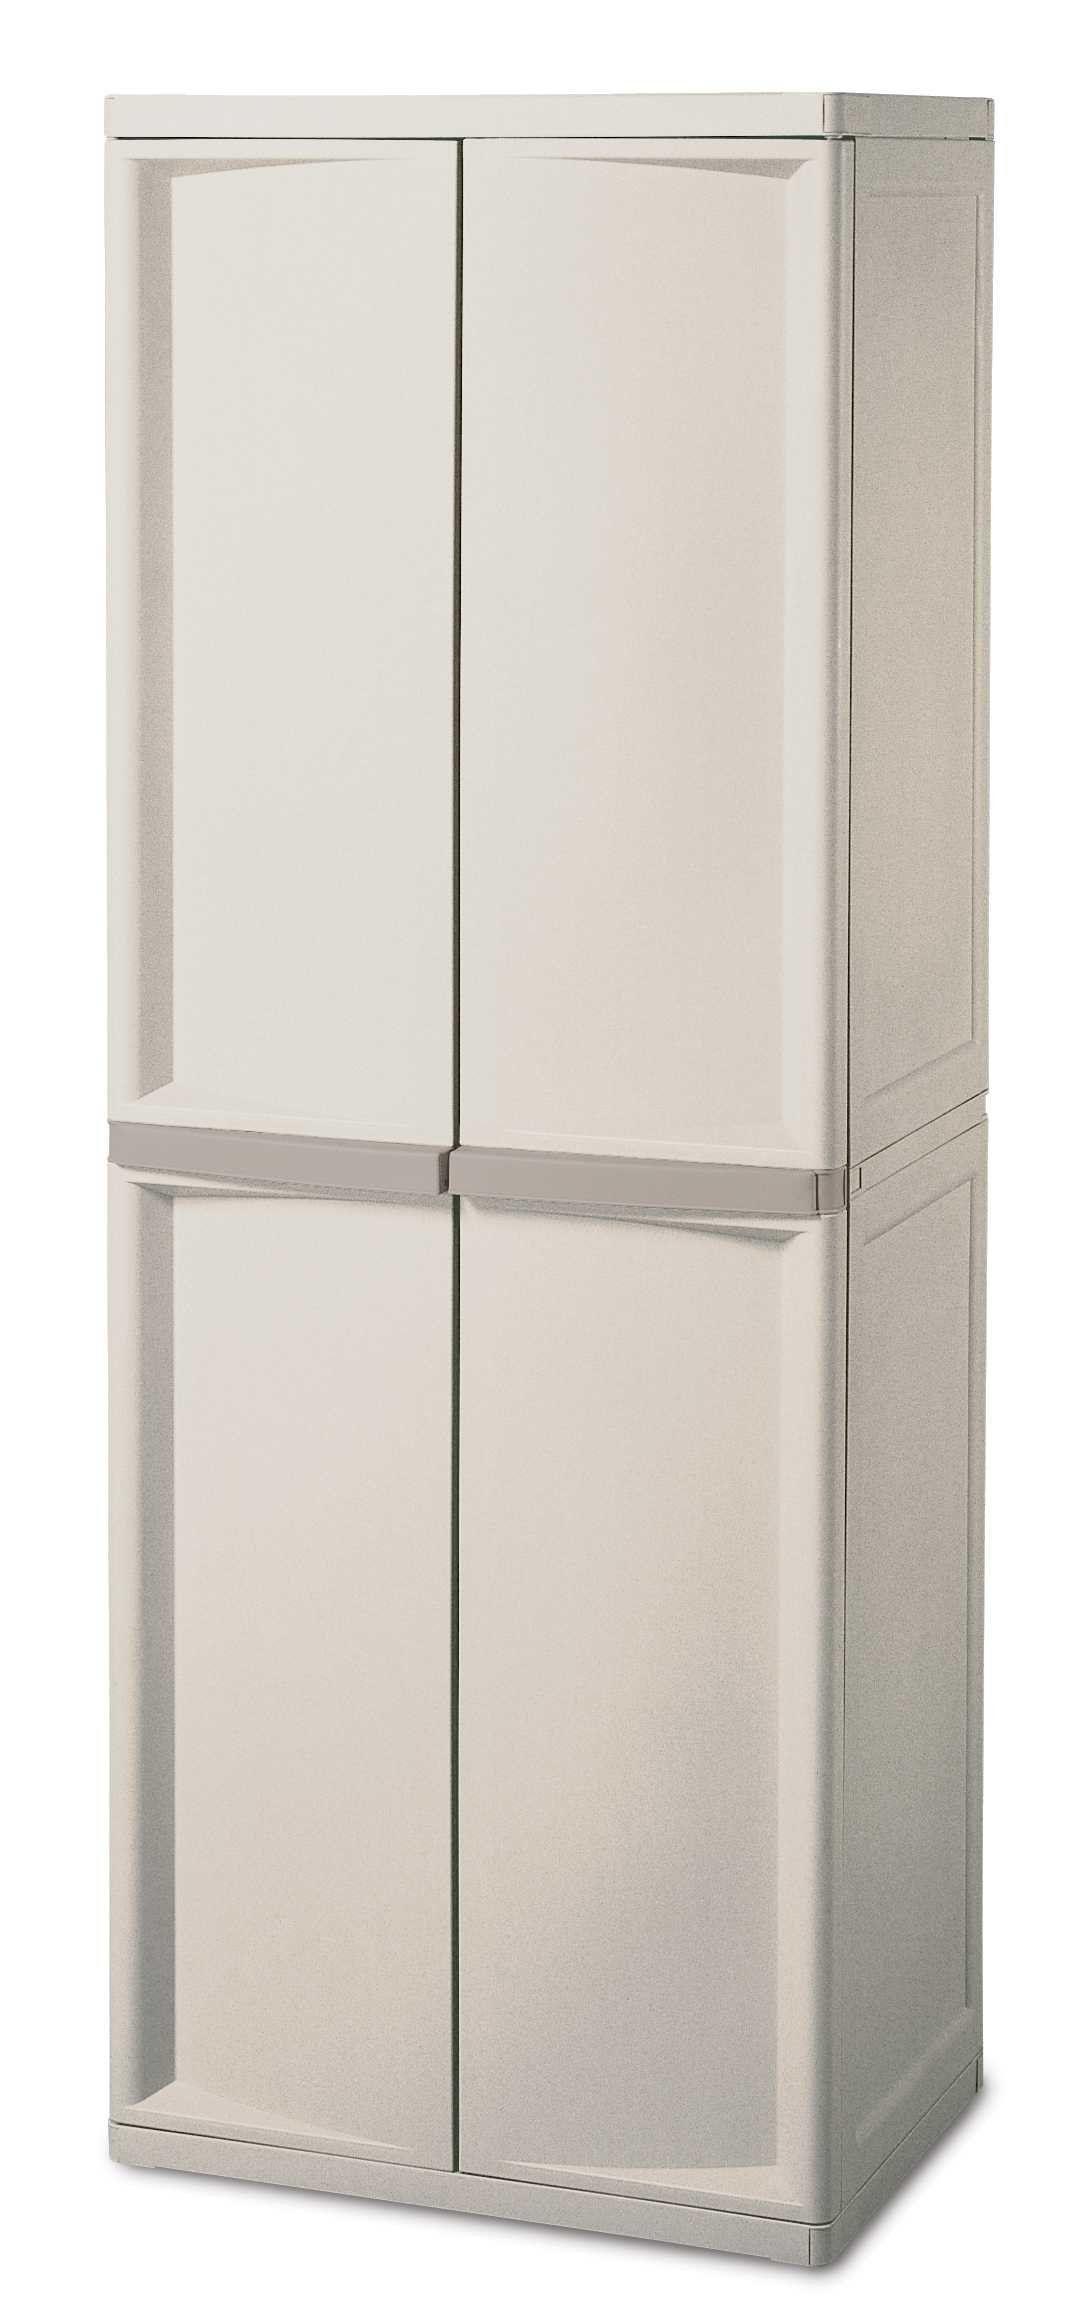 amazon com sterilite 01428501 4 shelf utility cabinet with putty rh pinterest com